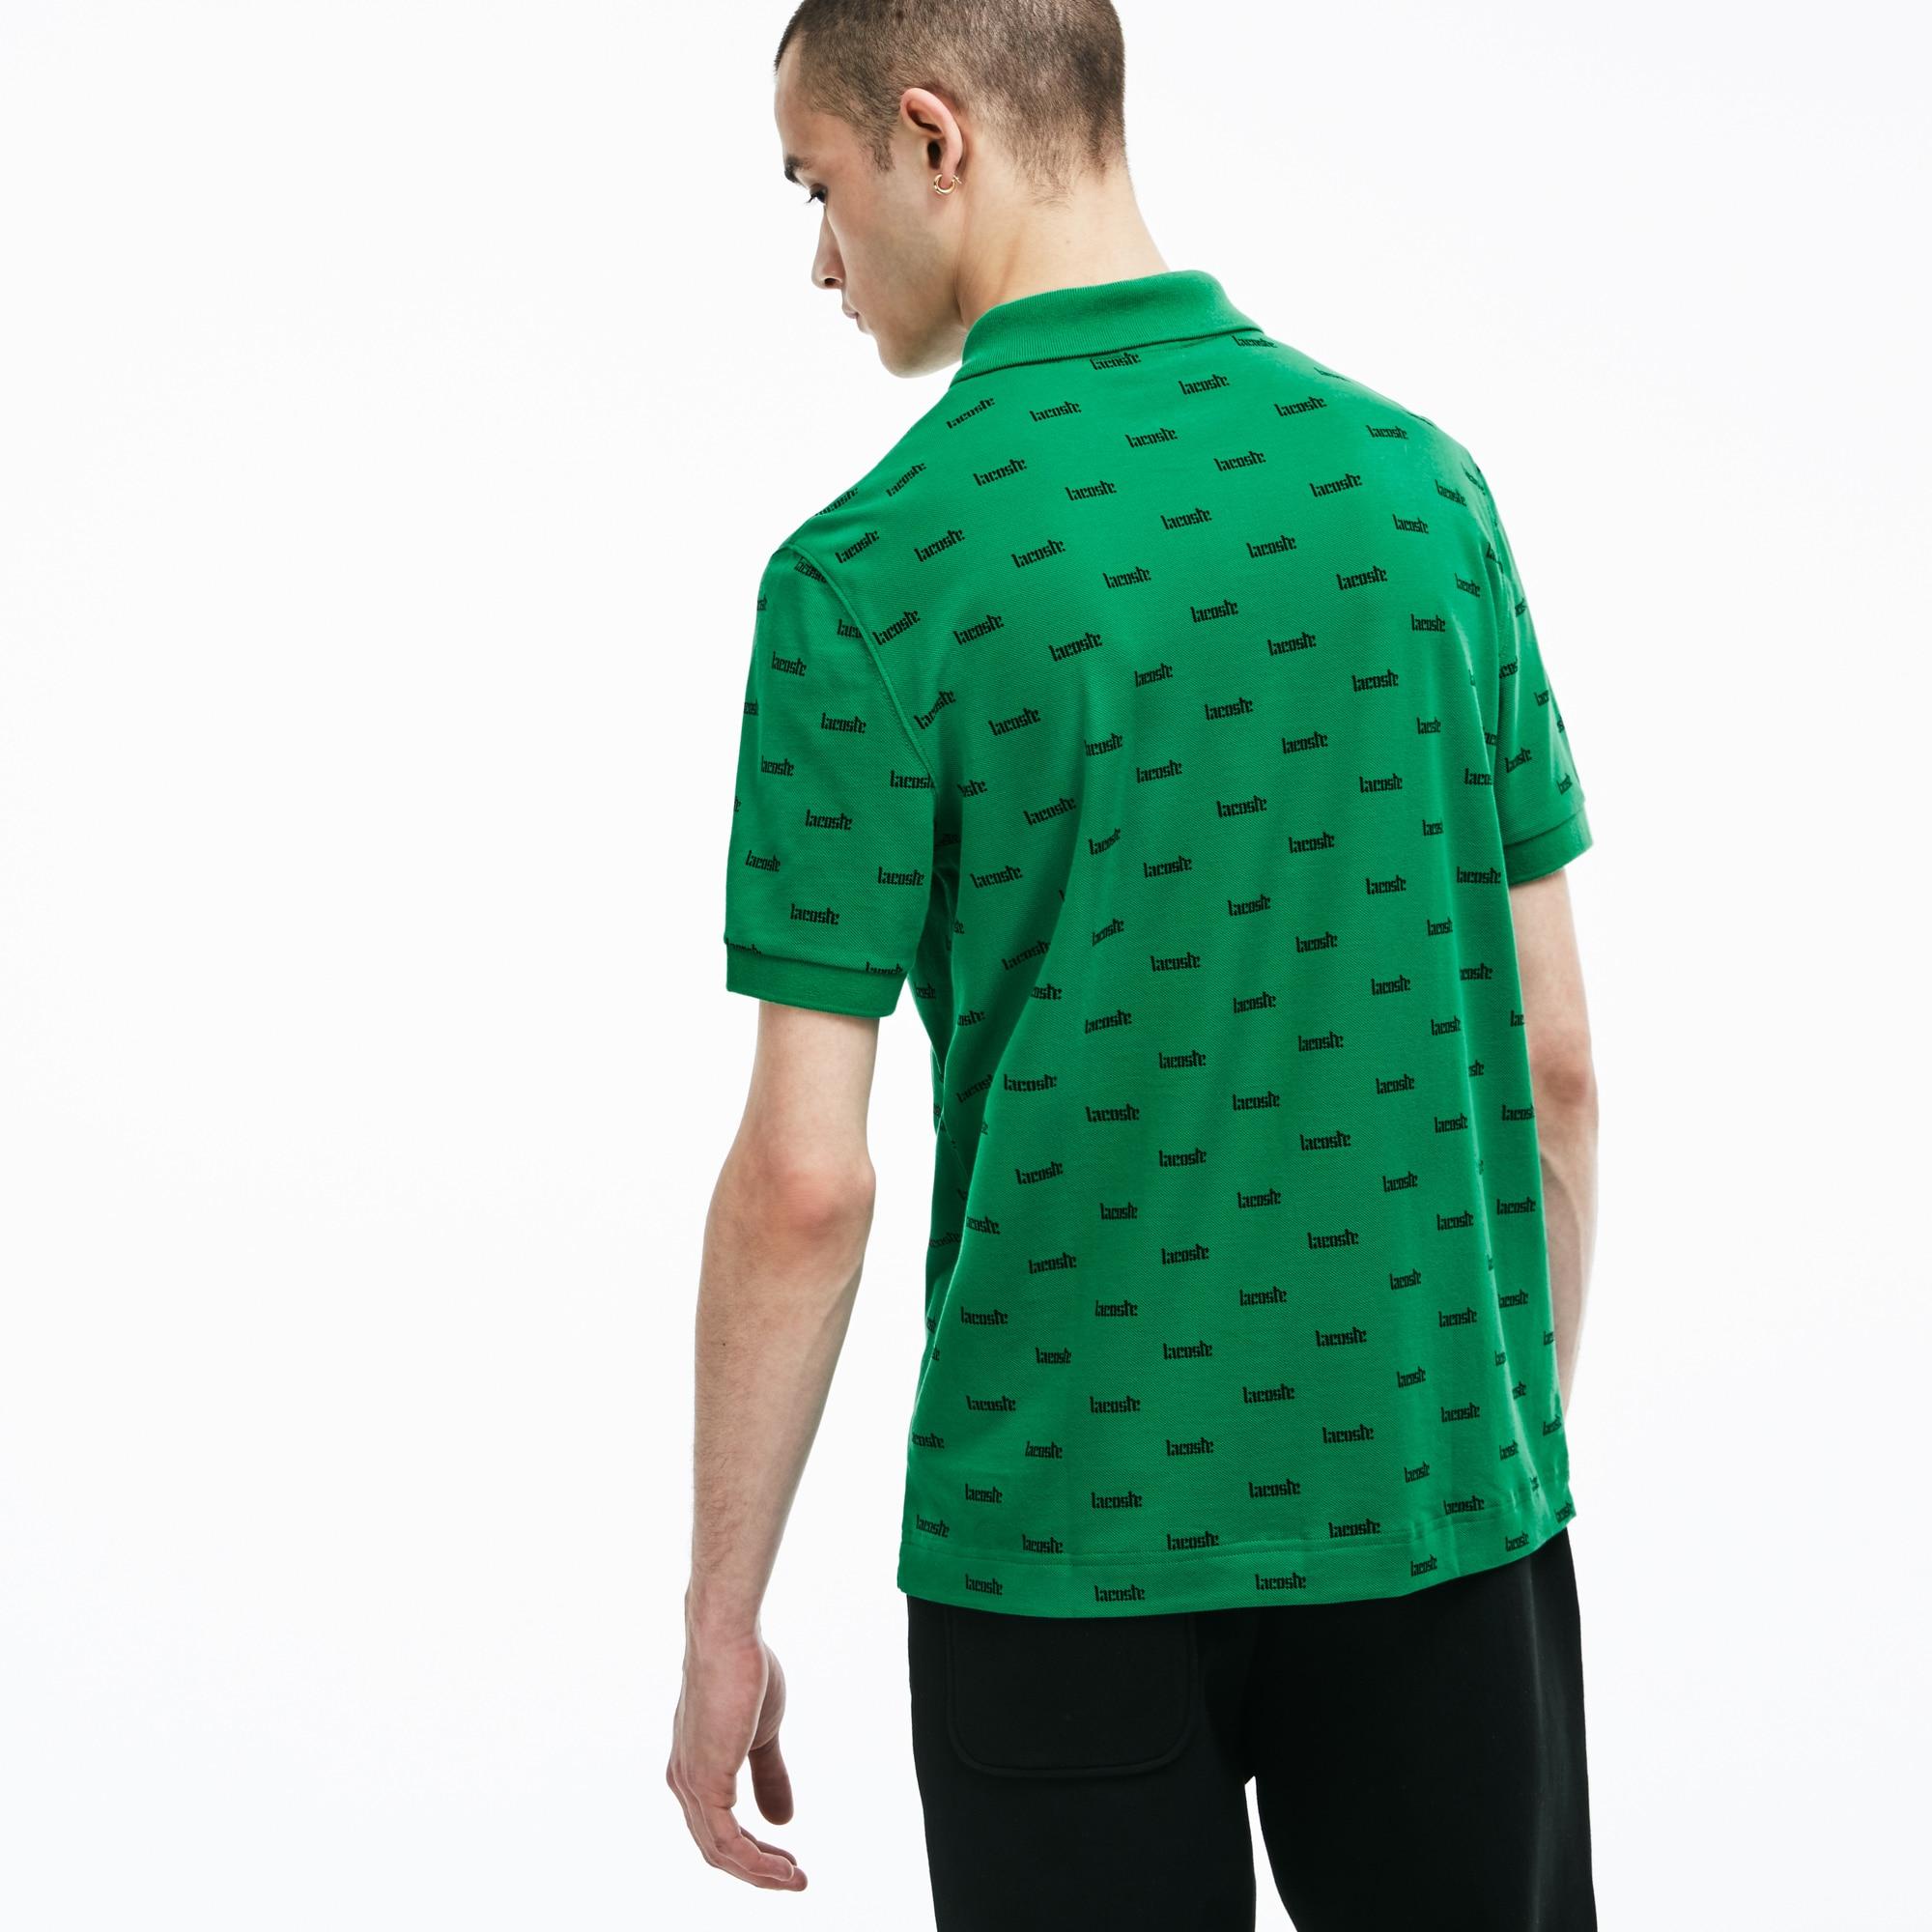 Lacoste LIVE男士修身版印花棉质迷你凸纹网眼面料Polo衫